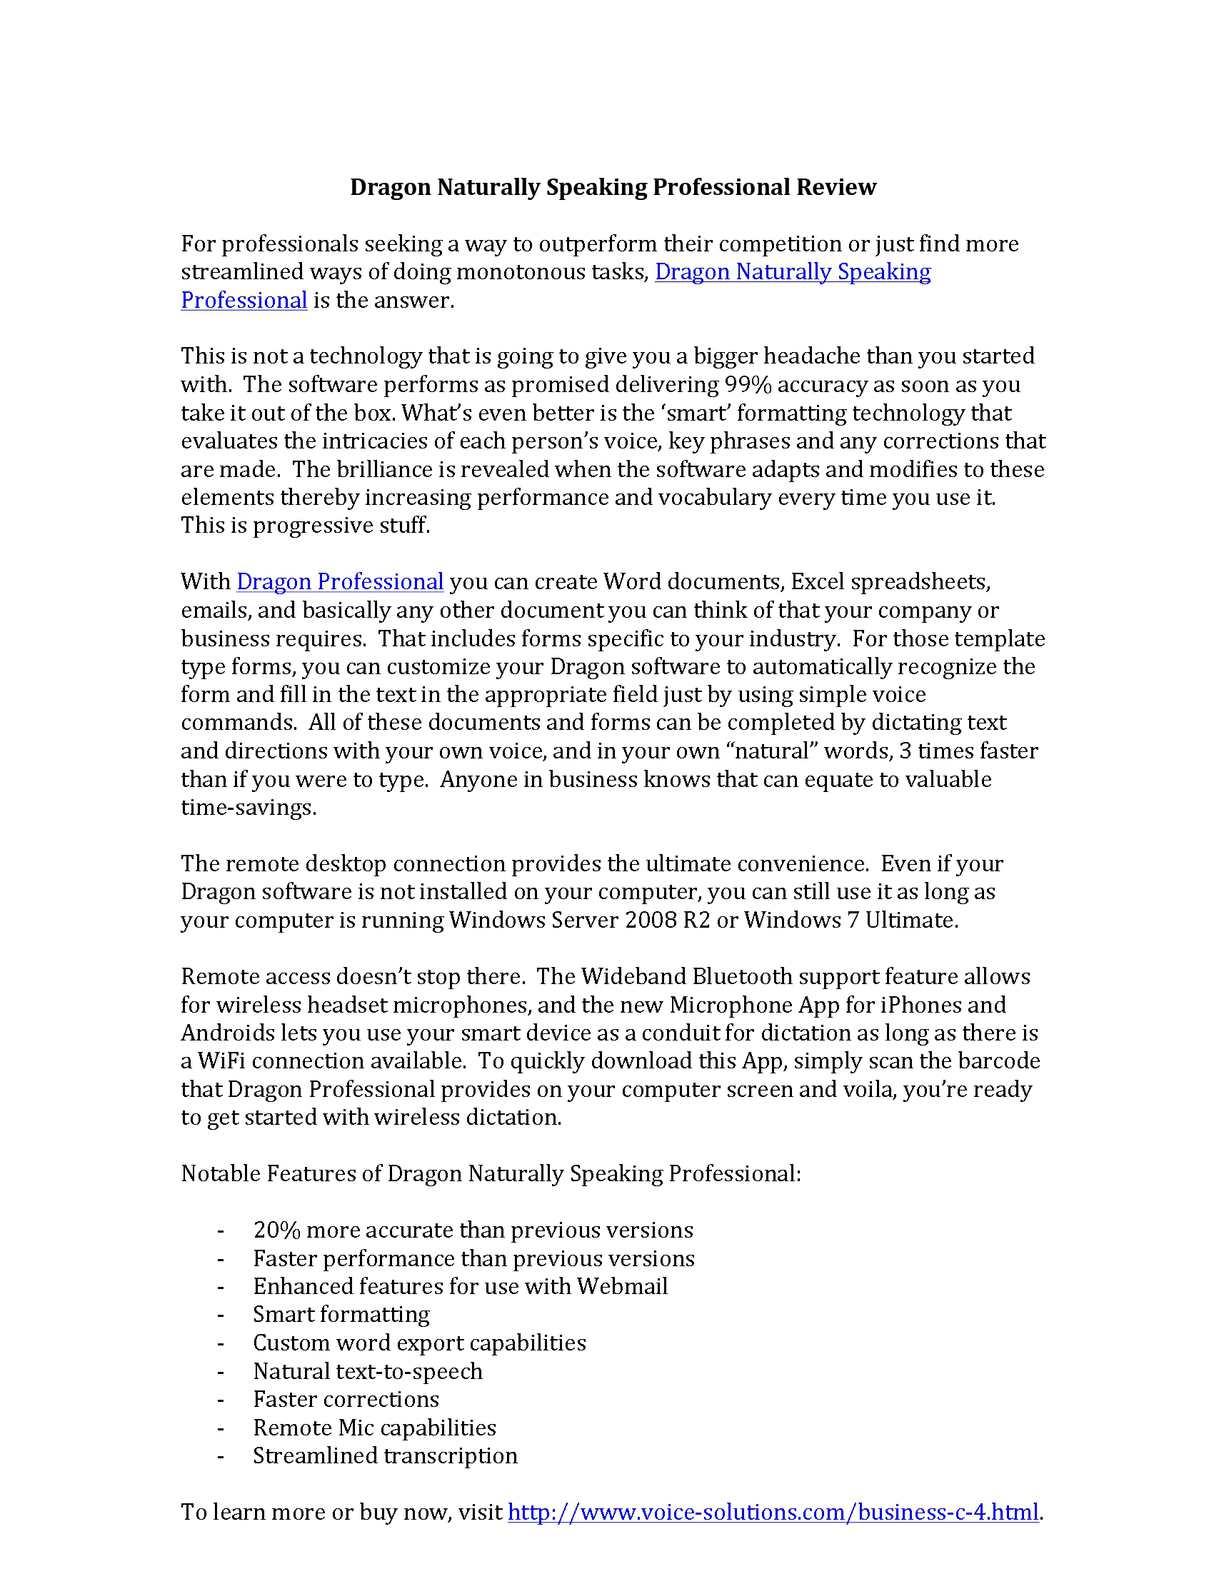 Calaméo - Dragon NaturallySpeaking Professional Review